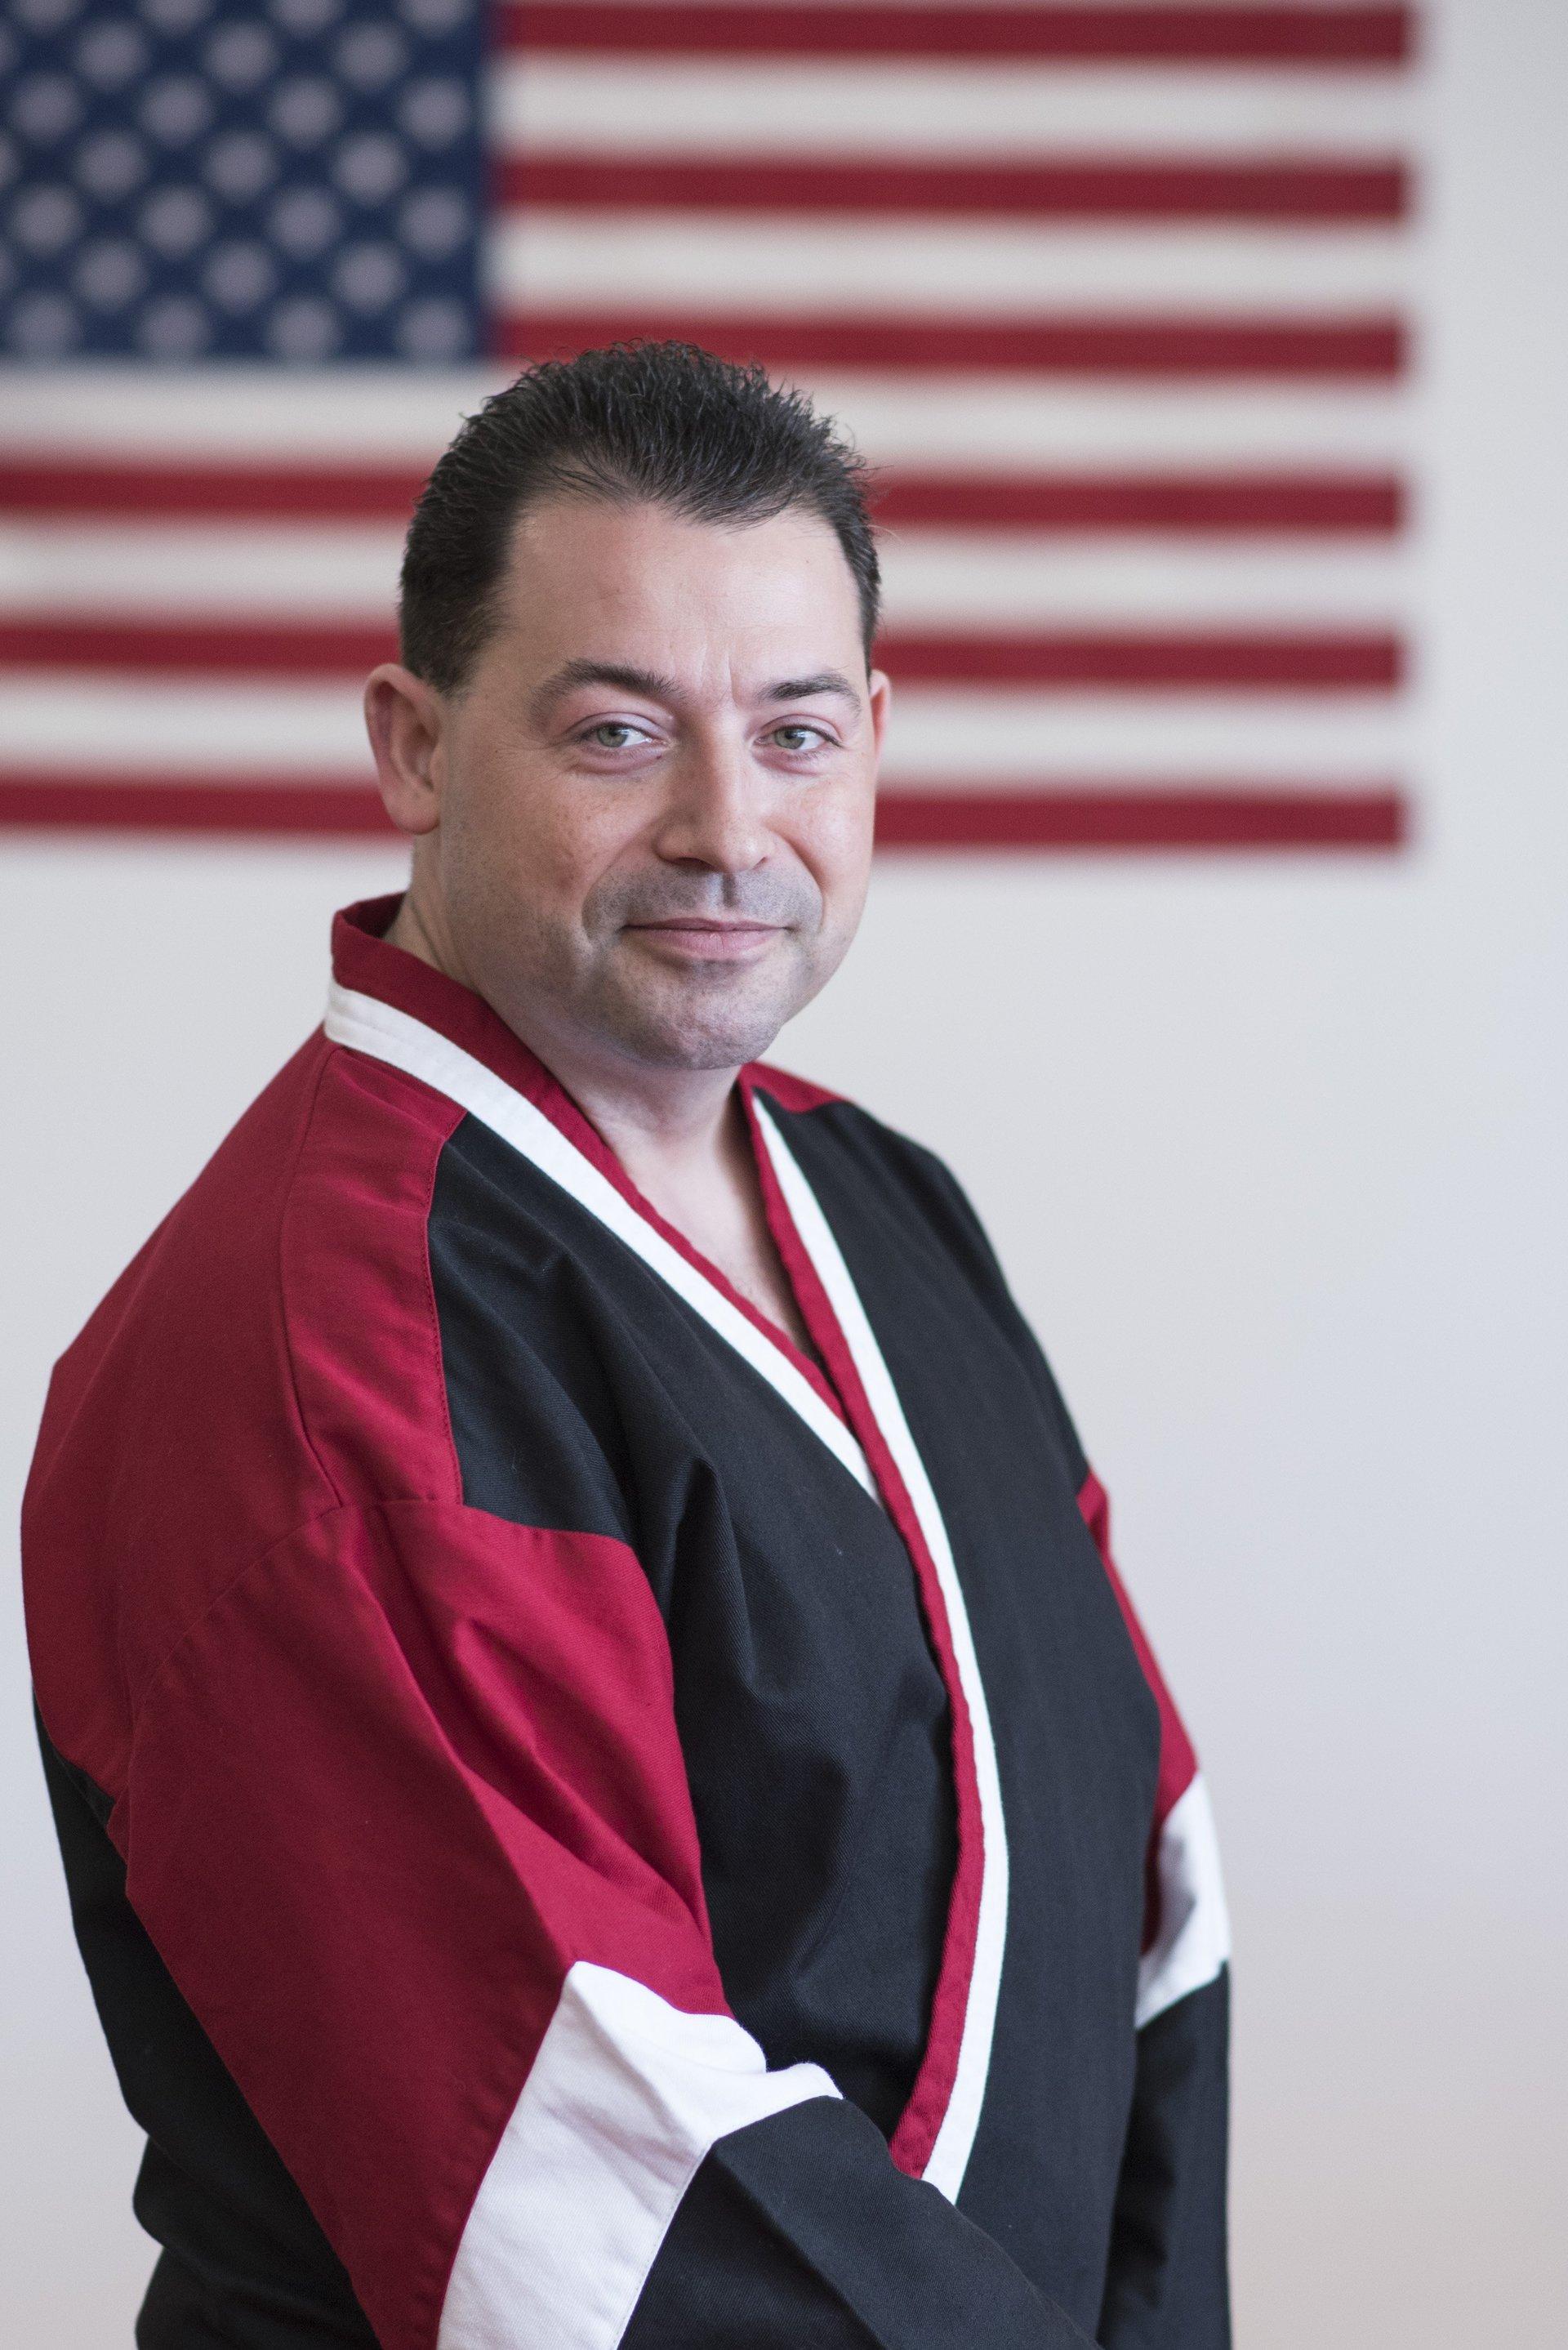 Ken Meier, Owner & Martial Arts Instructor in Buffalo NY